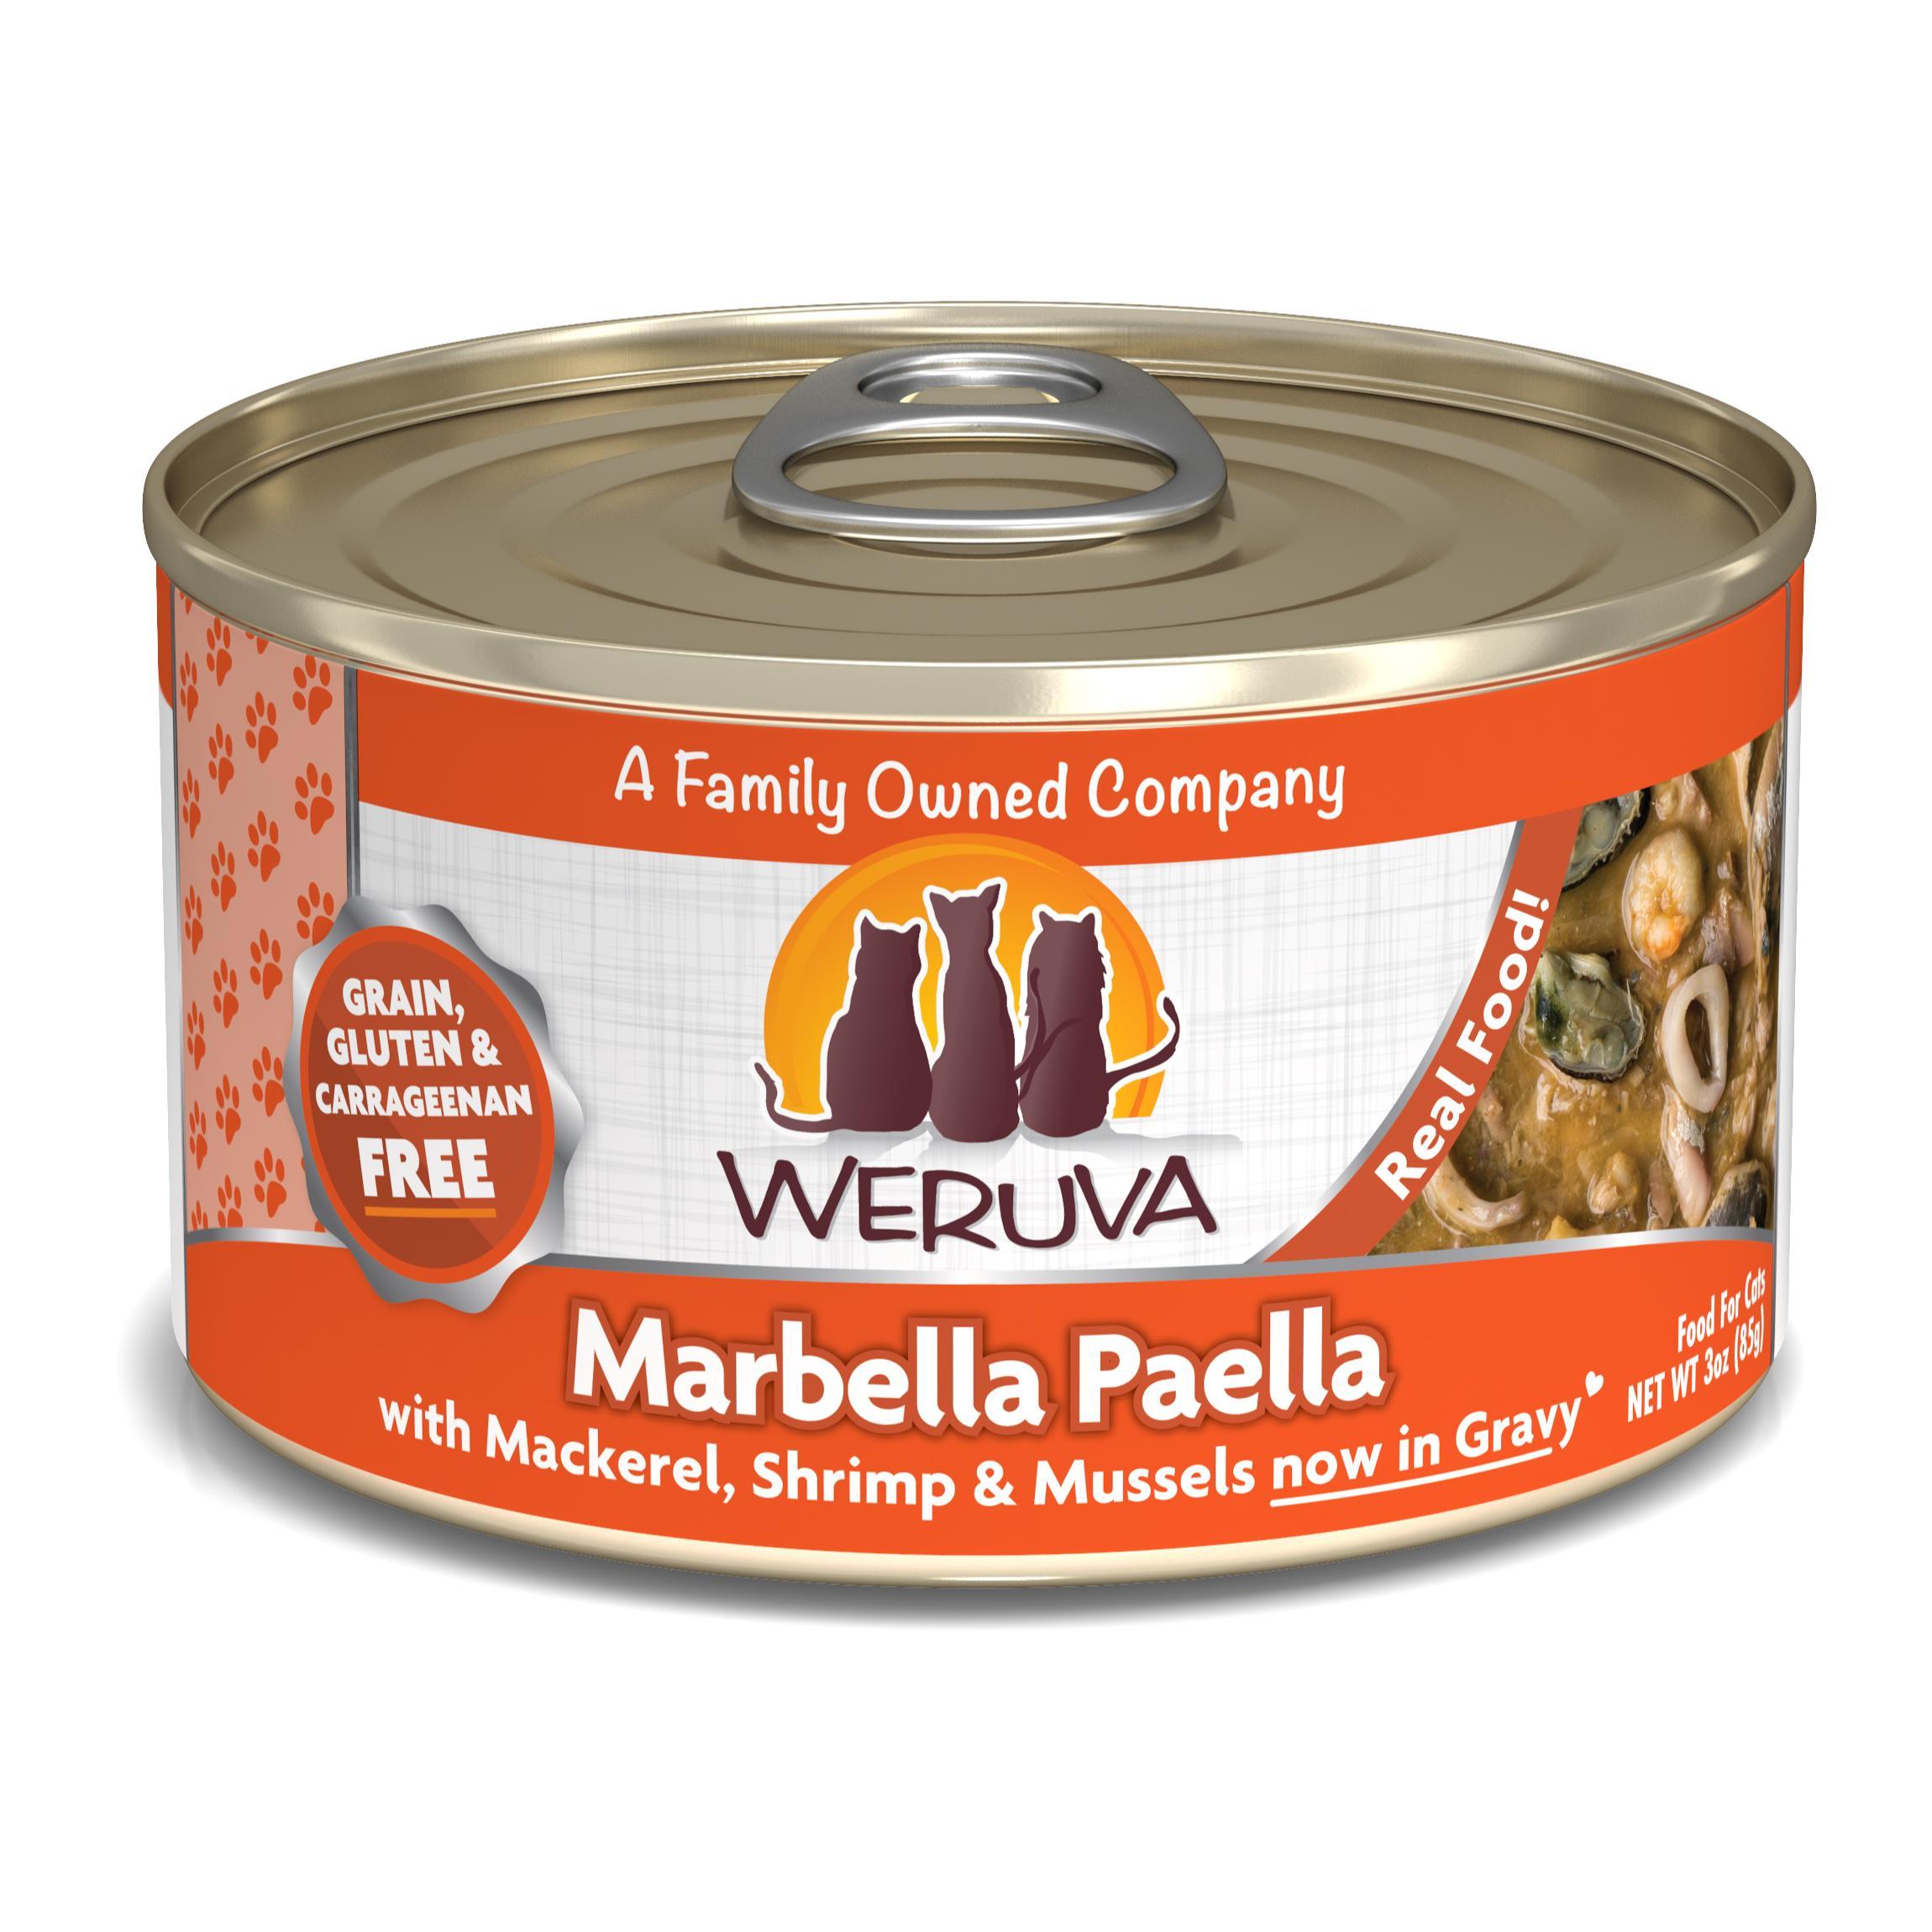 Weruva Cat Classic Marbella Paella with Mackerel, Shrimp & Mussels Grain-Free Wet Cat Food Image